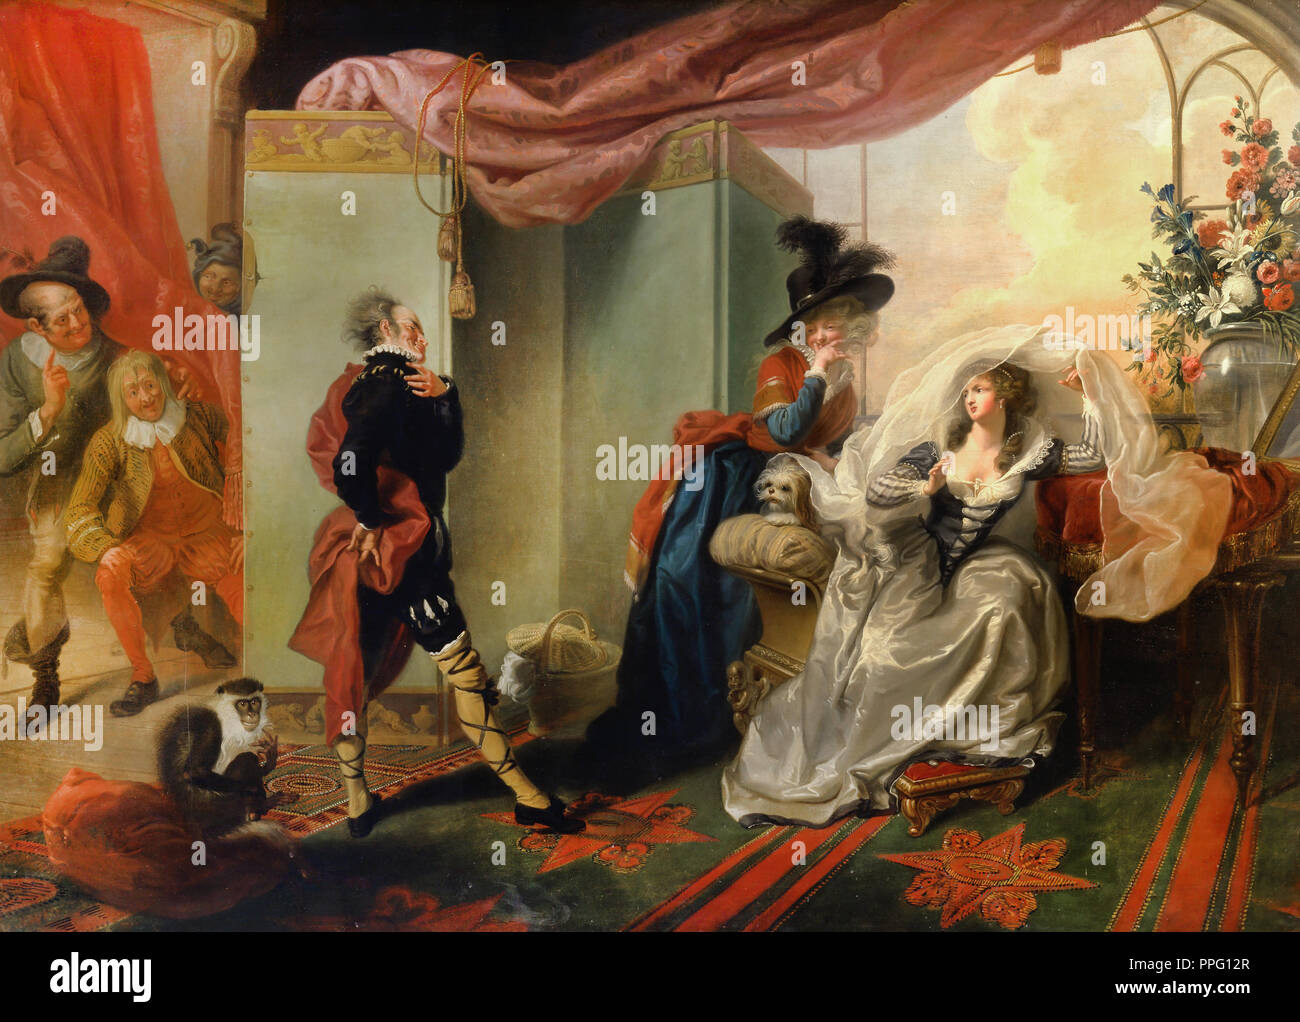 "Johann Heinrich Ramberg - Olivia, Maria and Malvolio from ""Twelfth Night,"" Act III, Scene iv. 1789 Oil on canvas. Yale Center for British Art, New Hav Stock Photo"